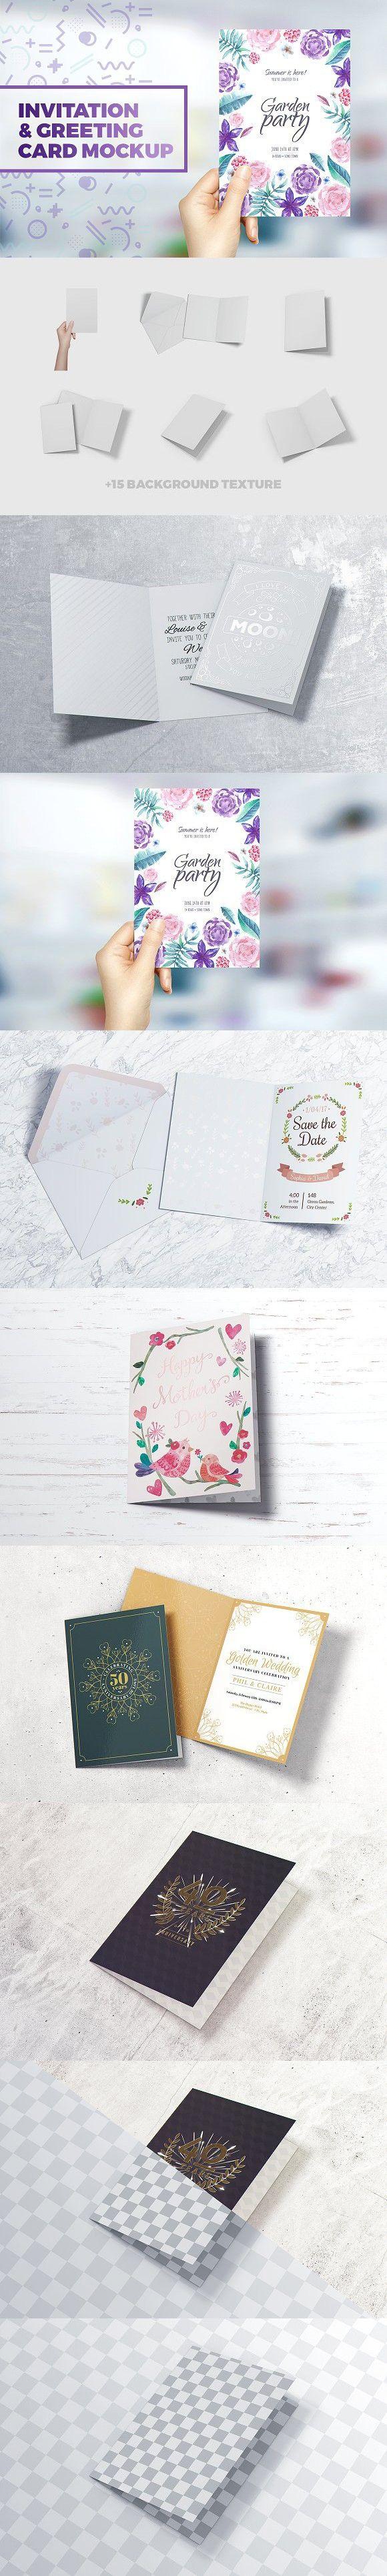 Invitation & Greeting Card Mockup. Wedding Card Templates